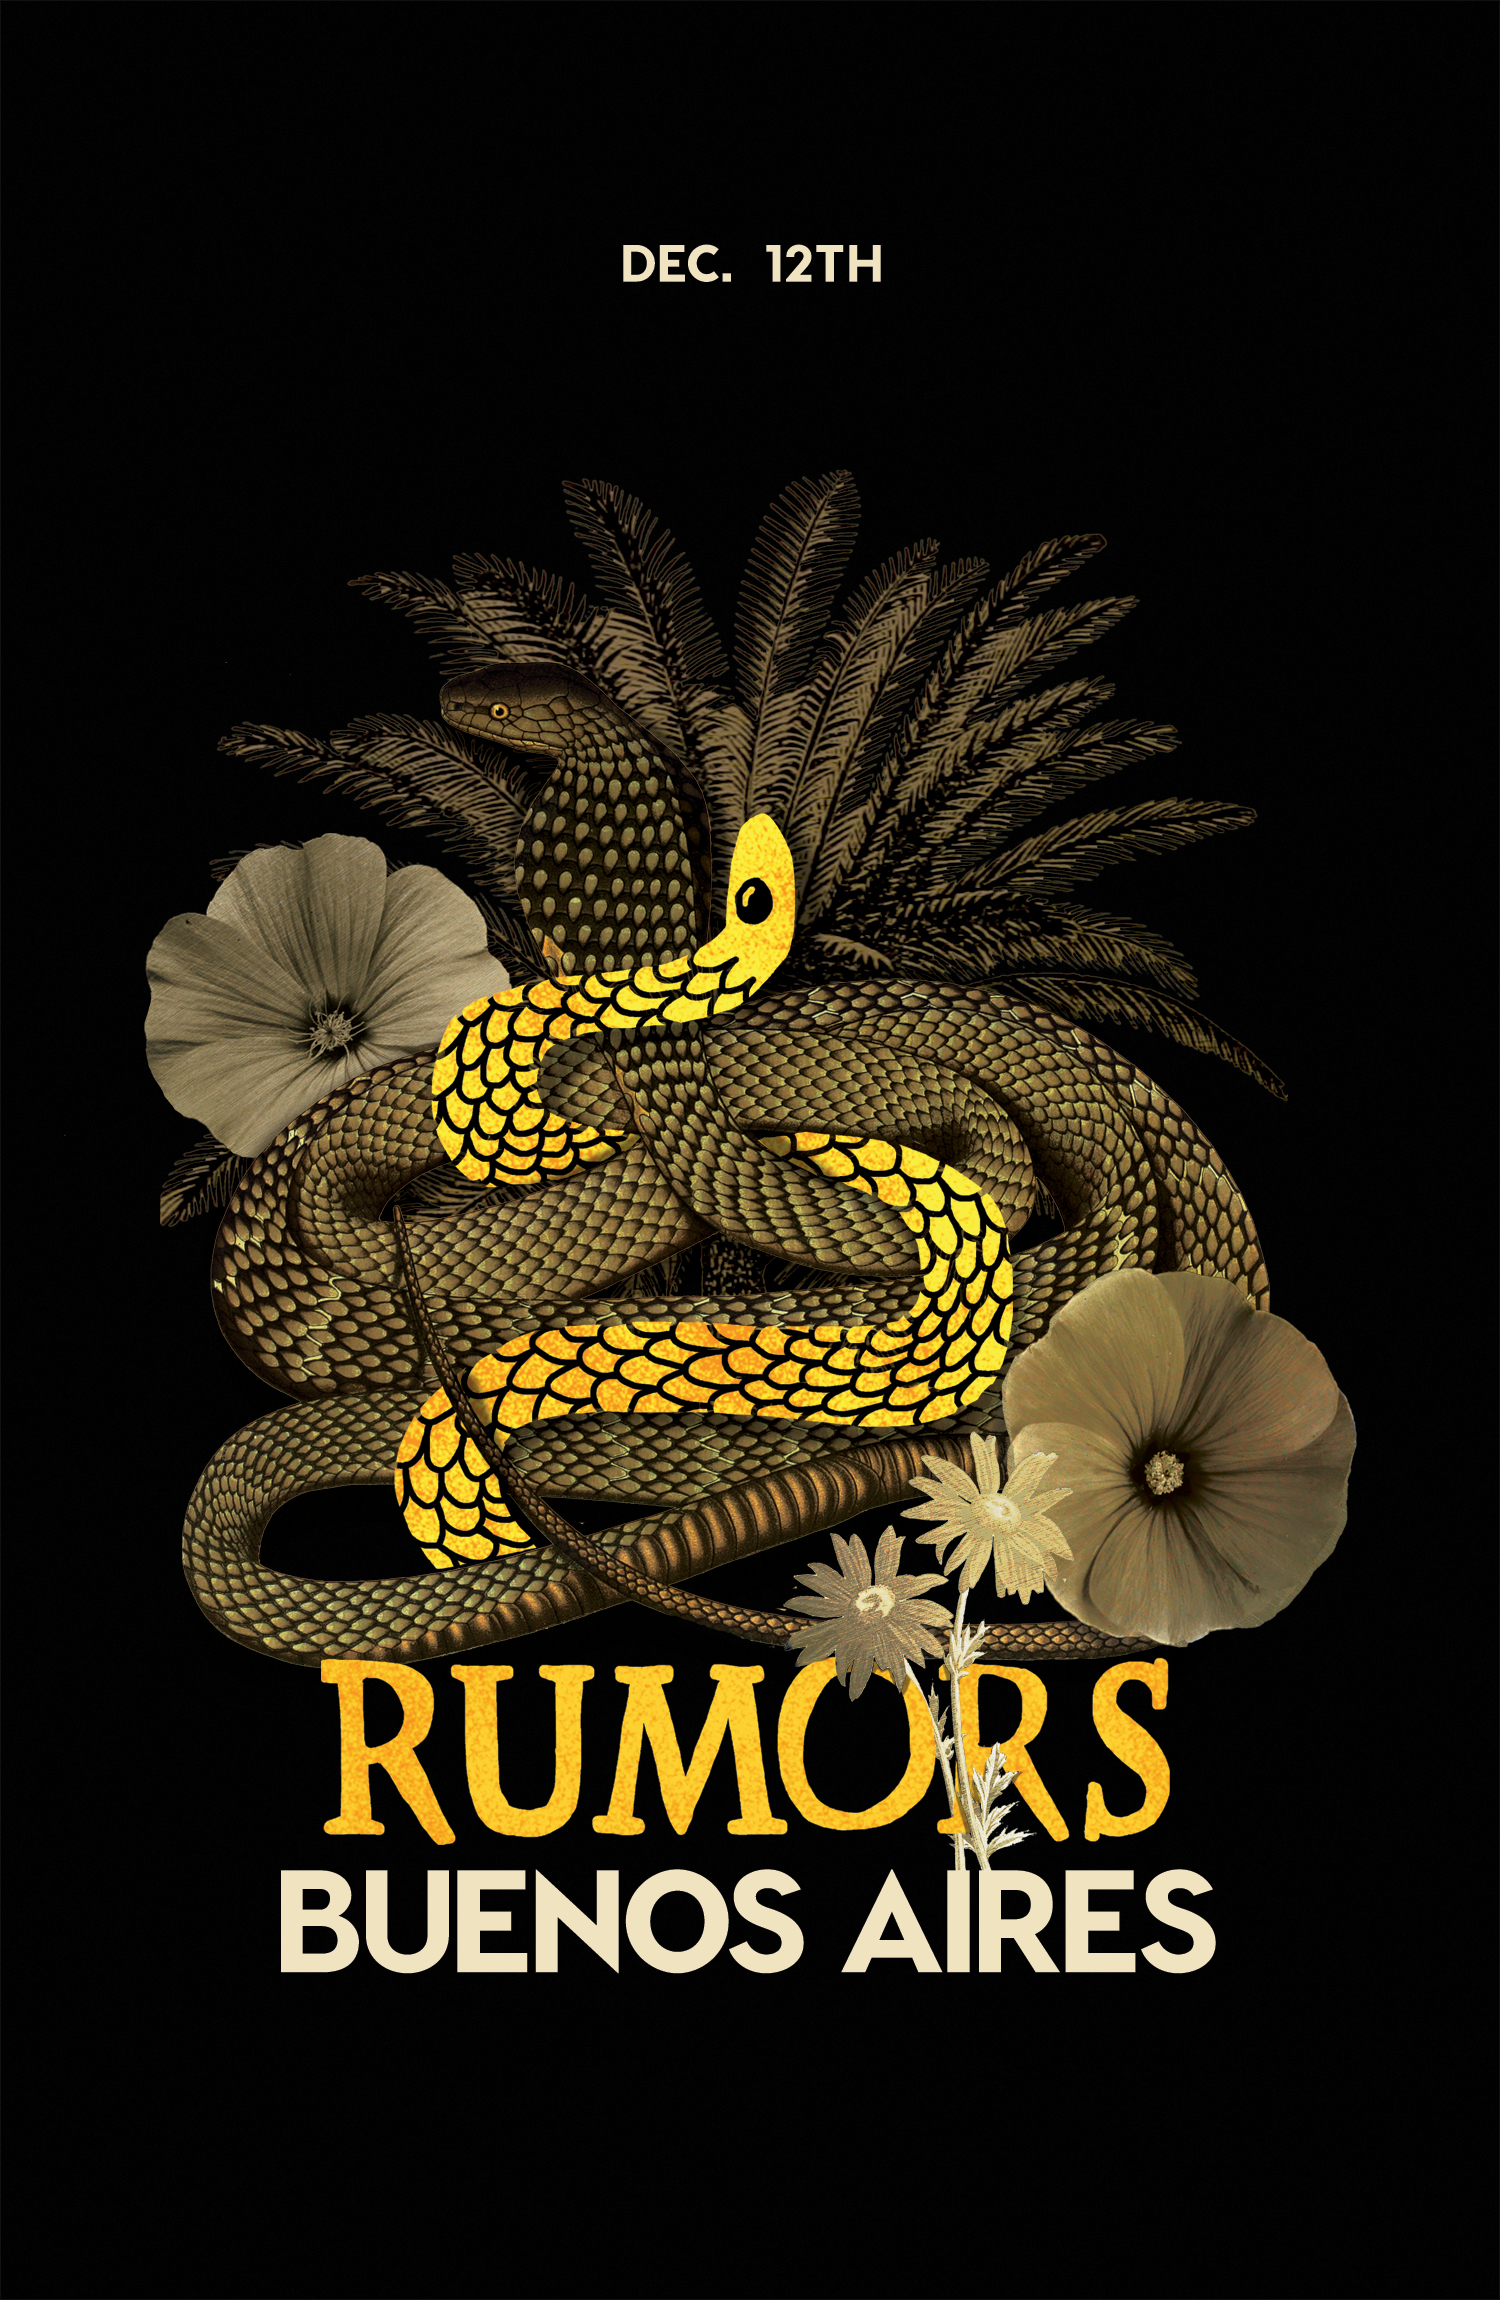 Rumors-BUENOS-AIRES-11x17.jpg